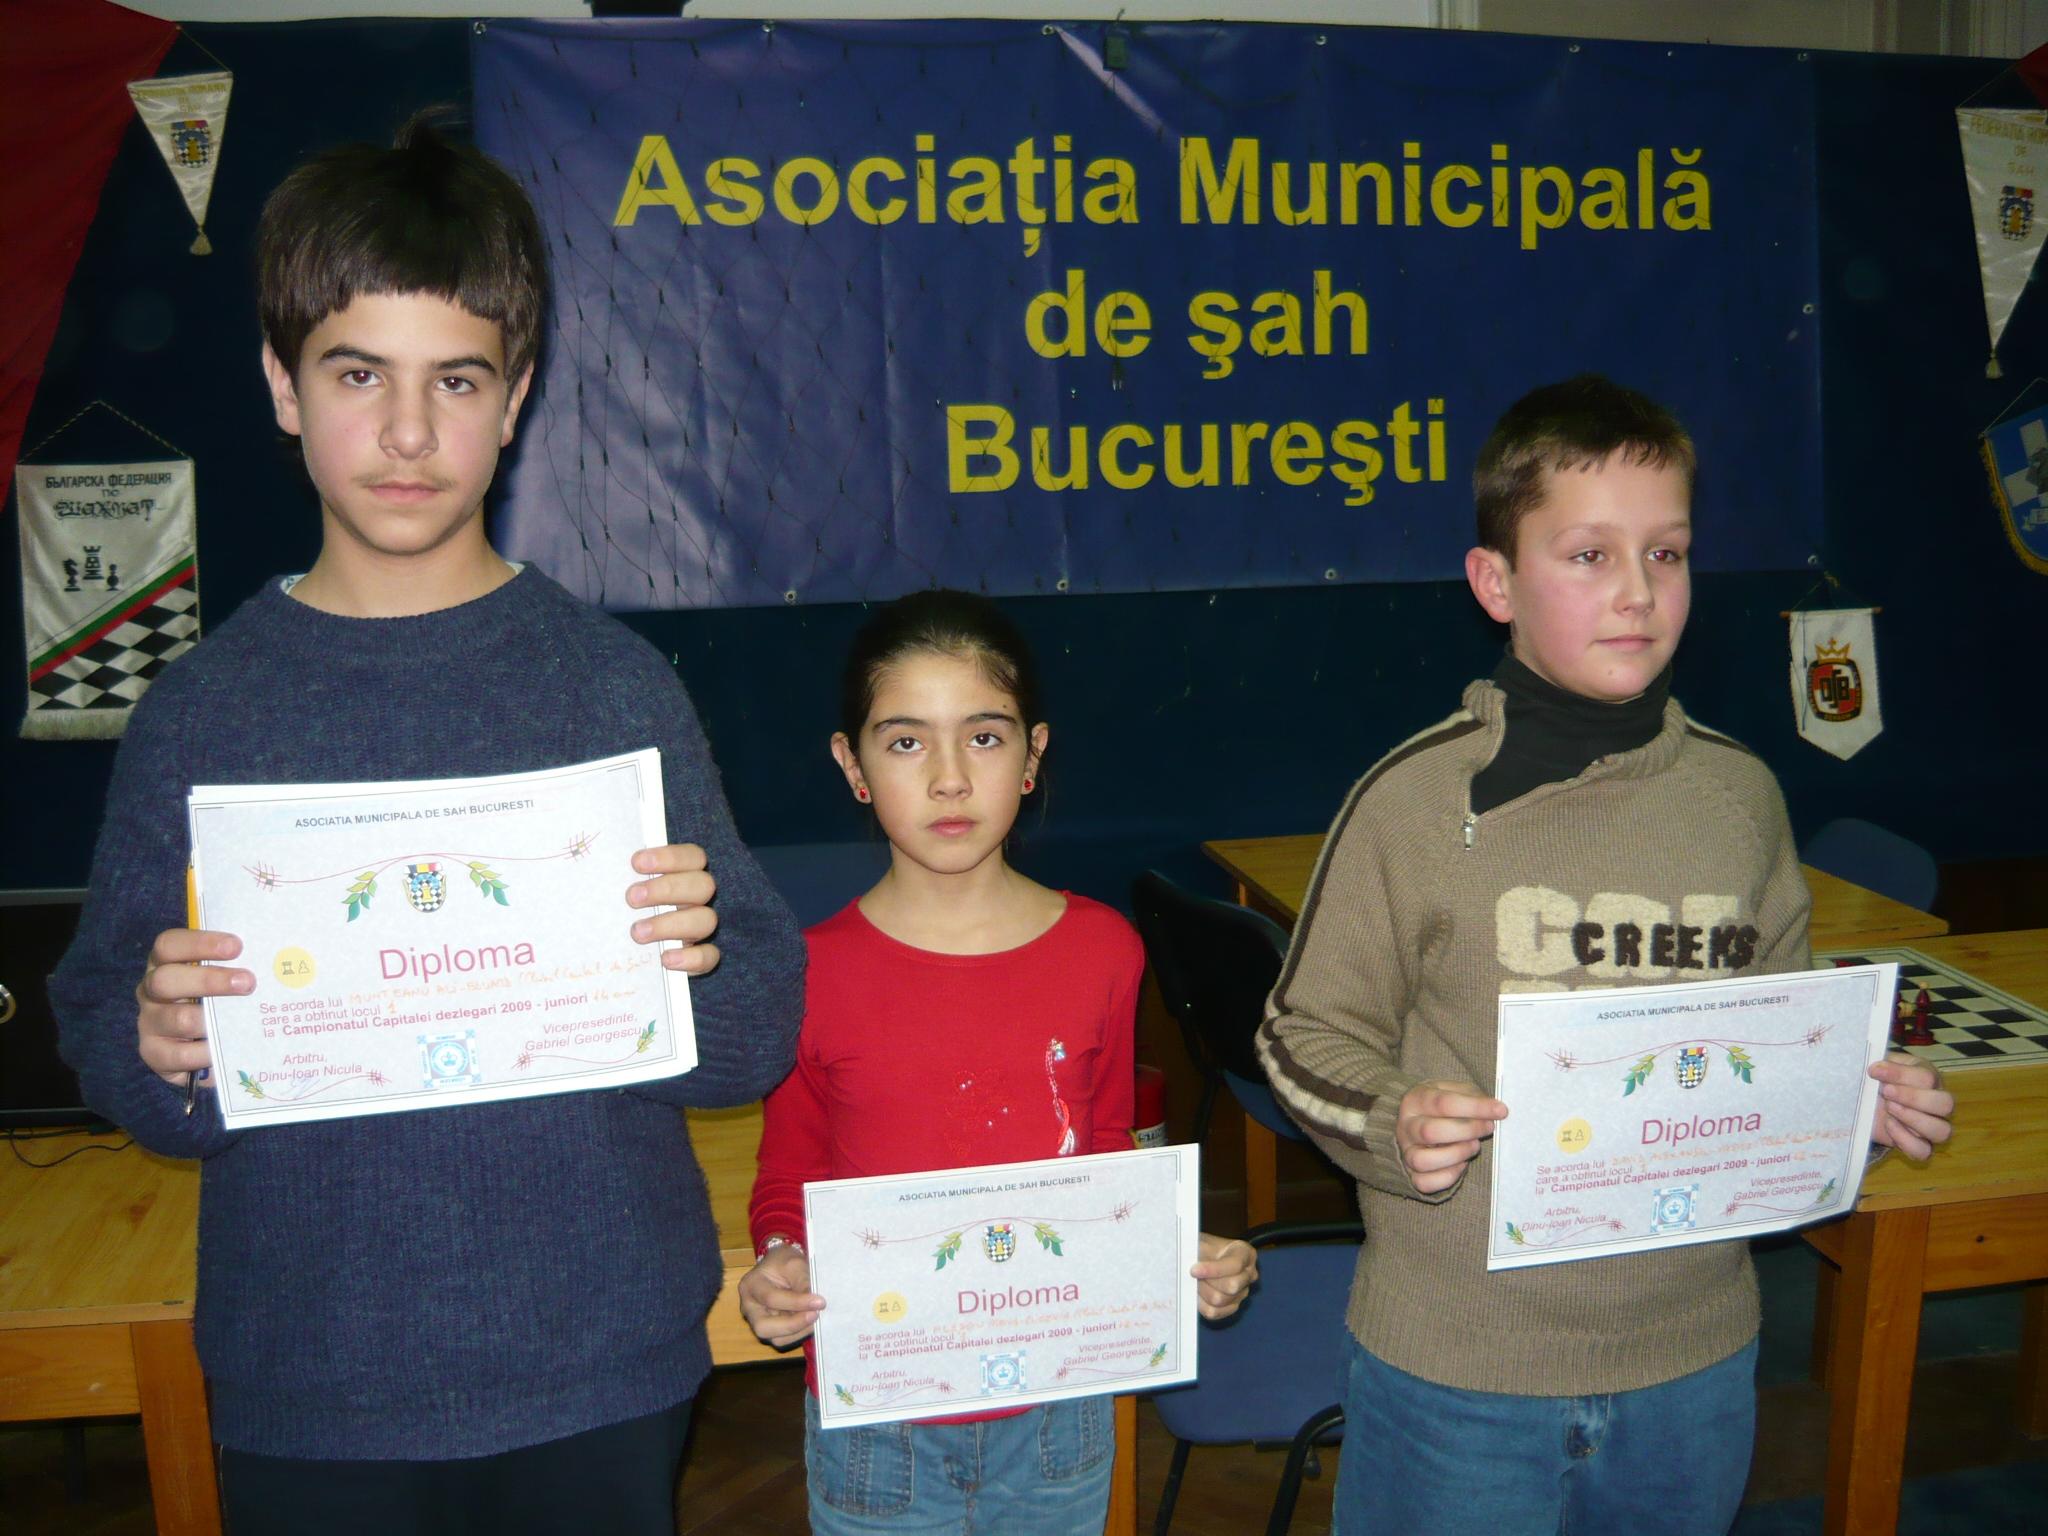 castigatorii-la-12-14-ani_munteanu_plesoiu_david2